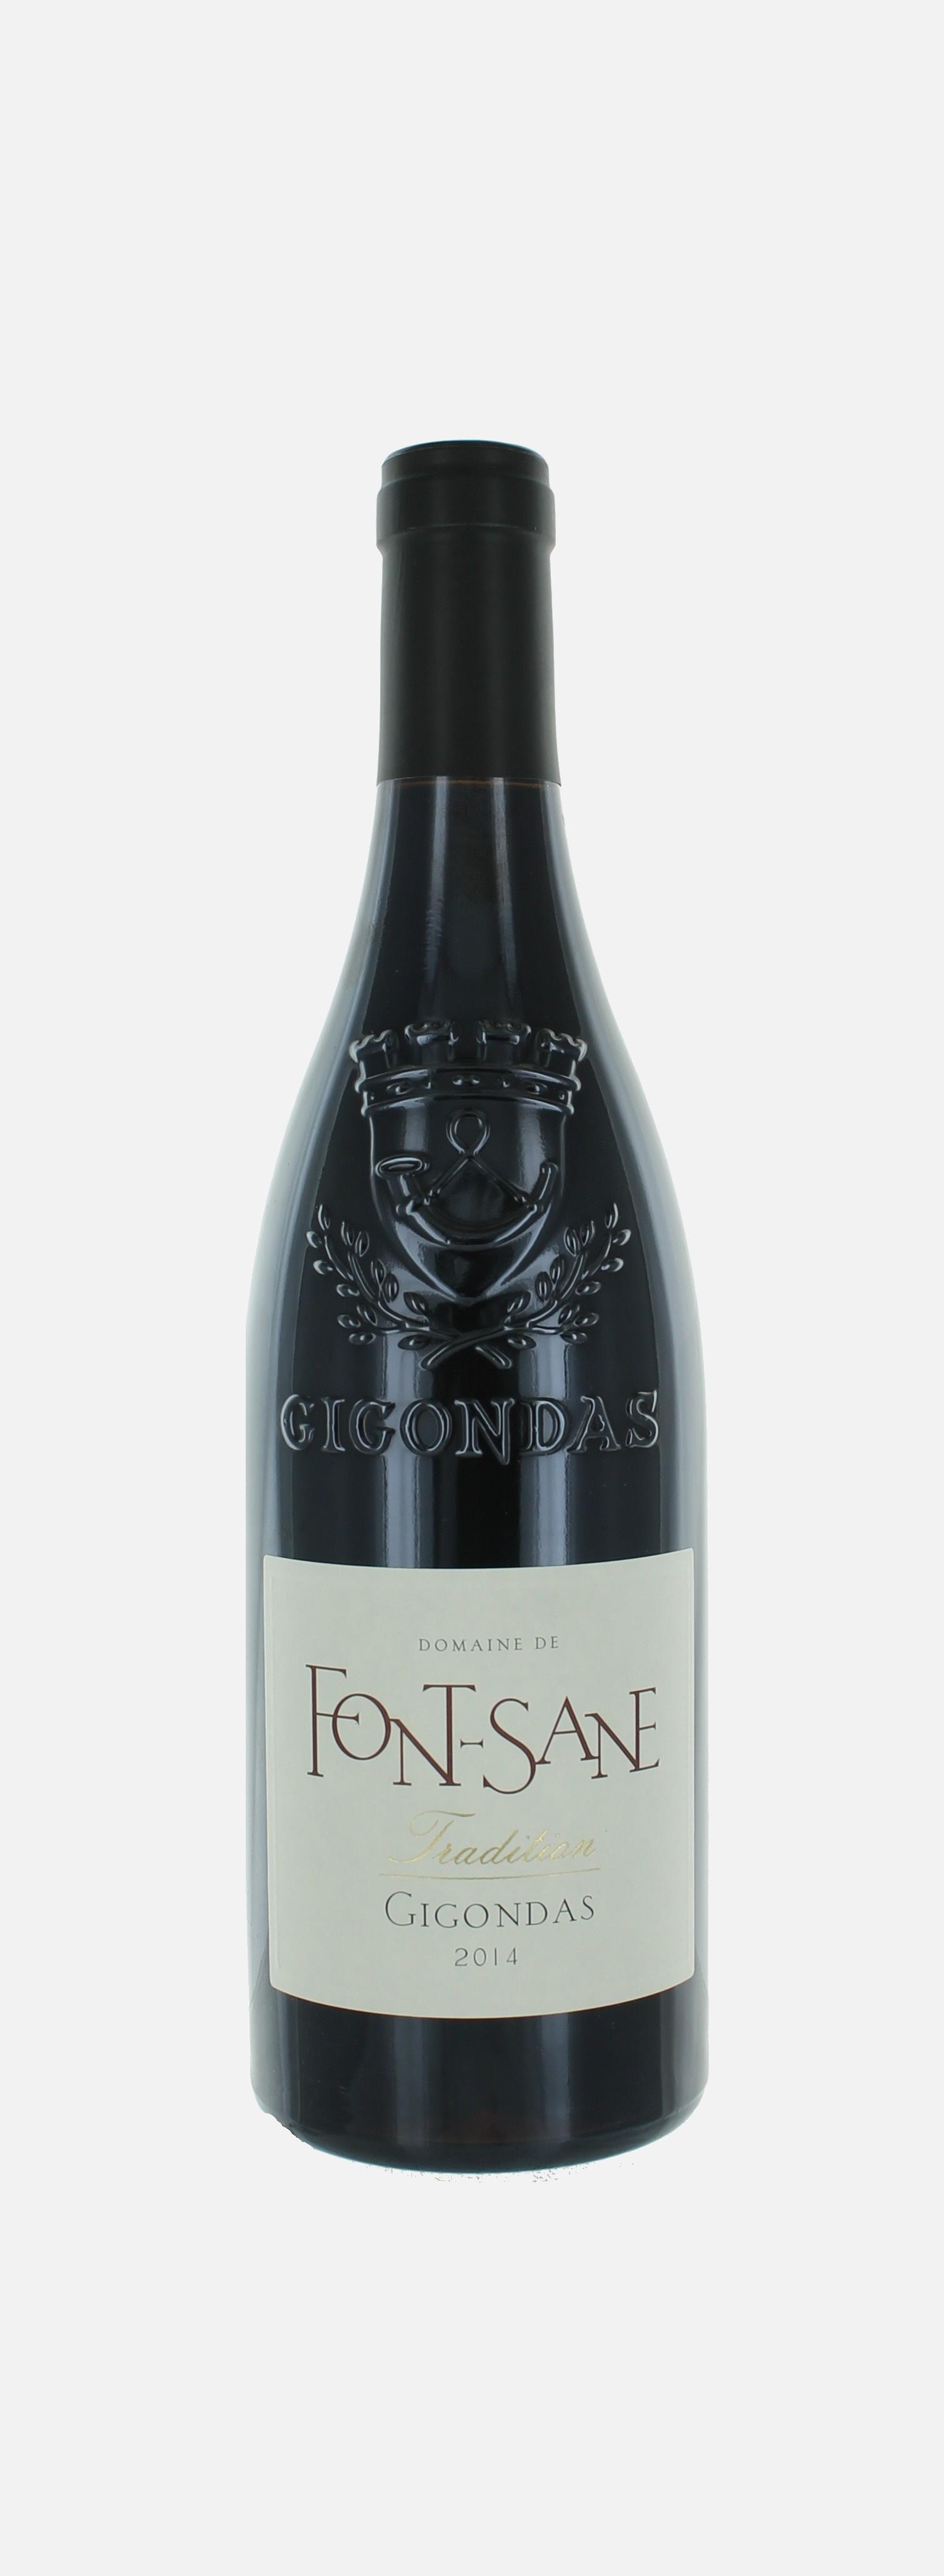 Tradition, Gigondas, Domaine Font Sane